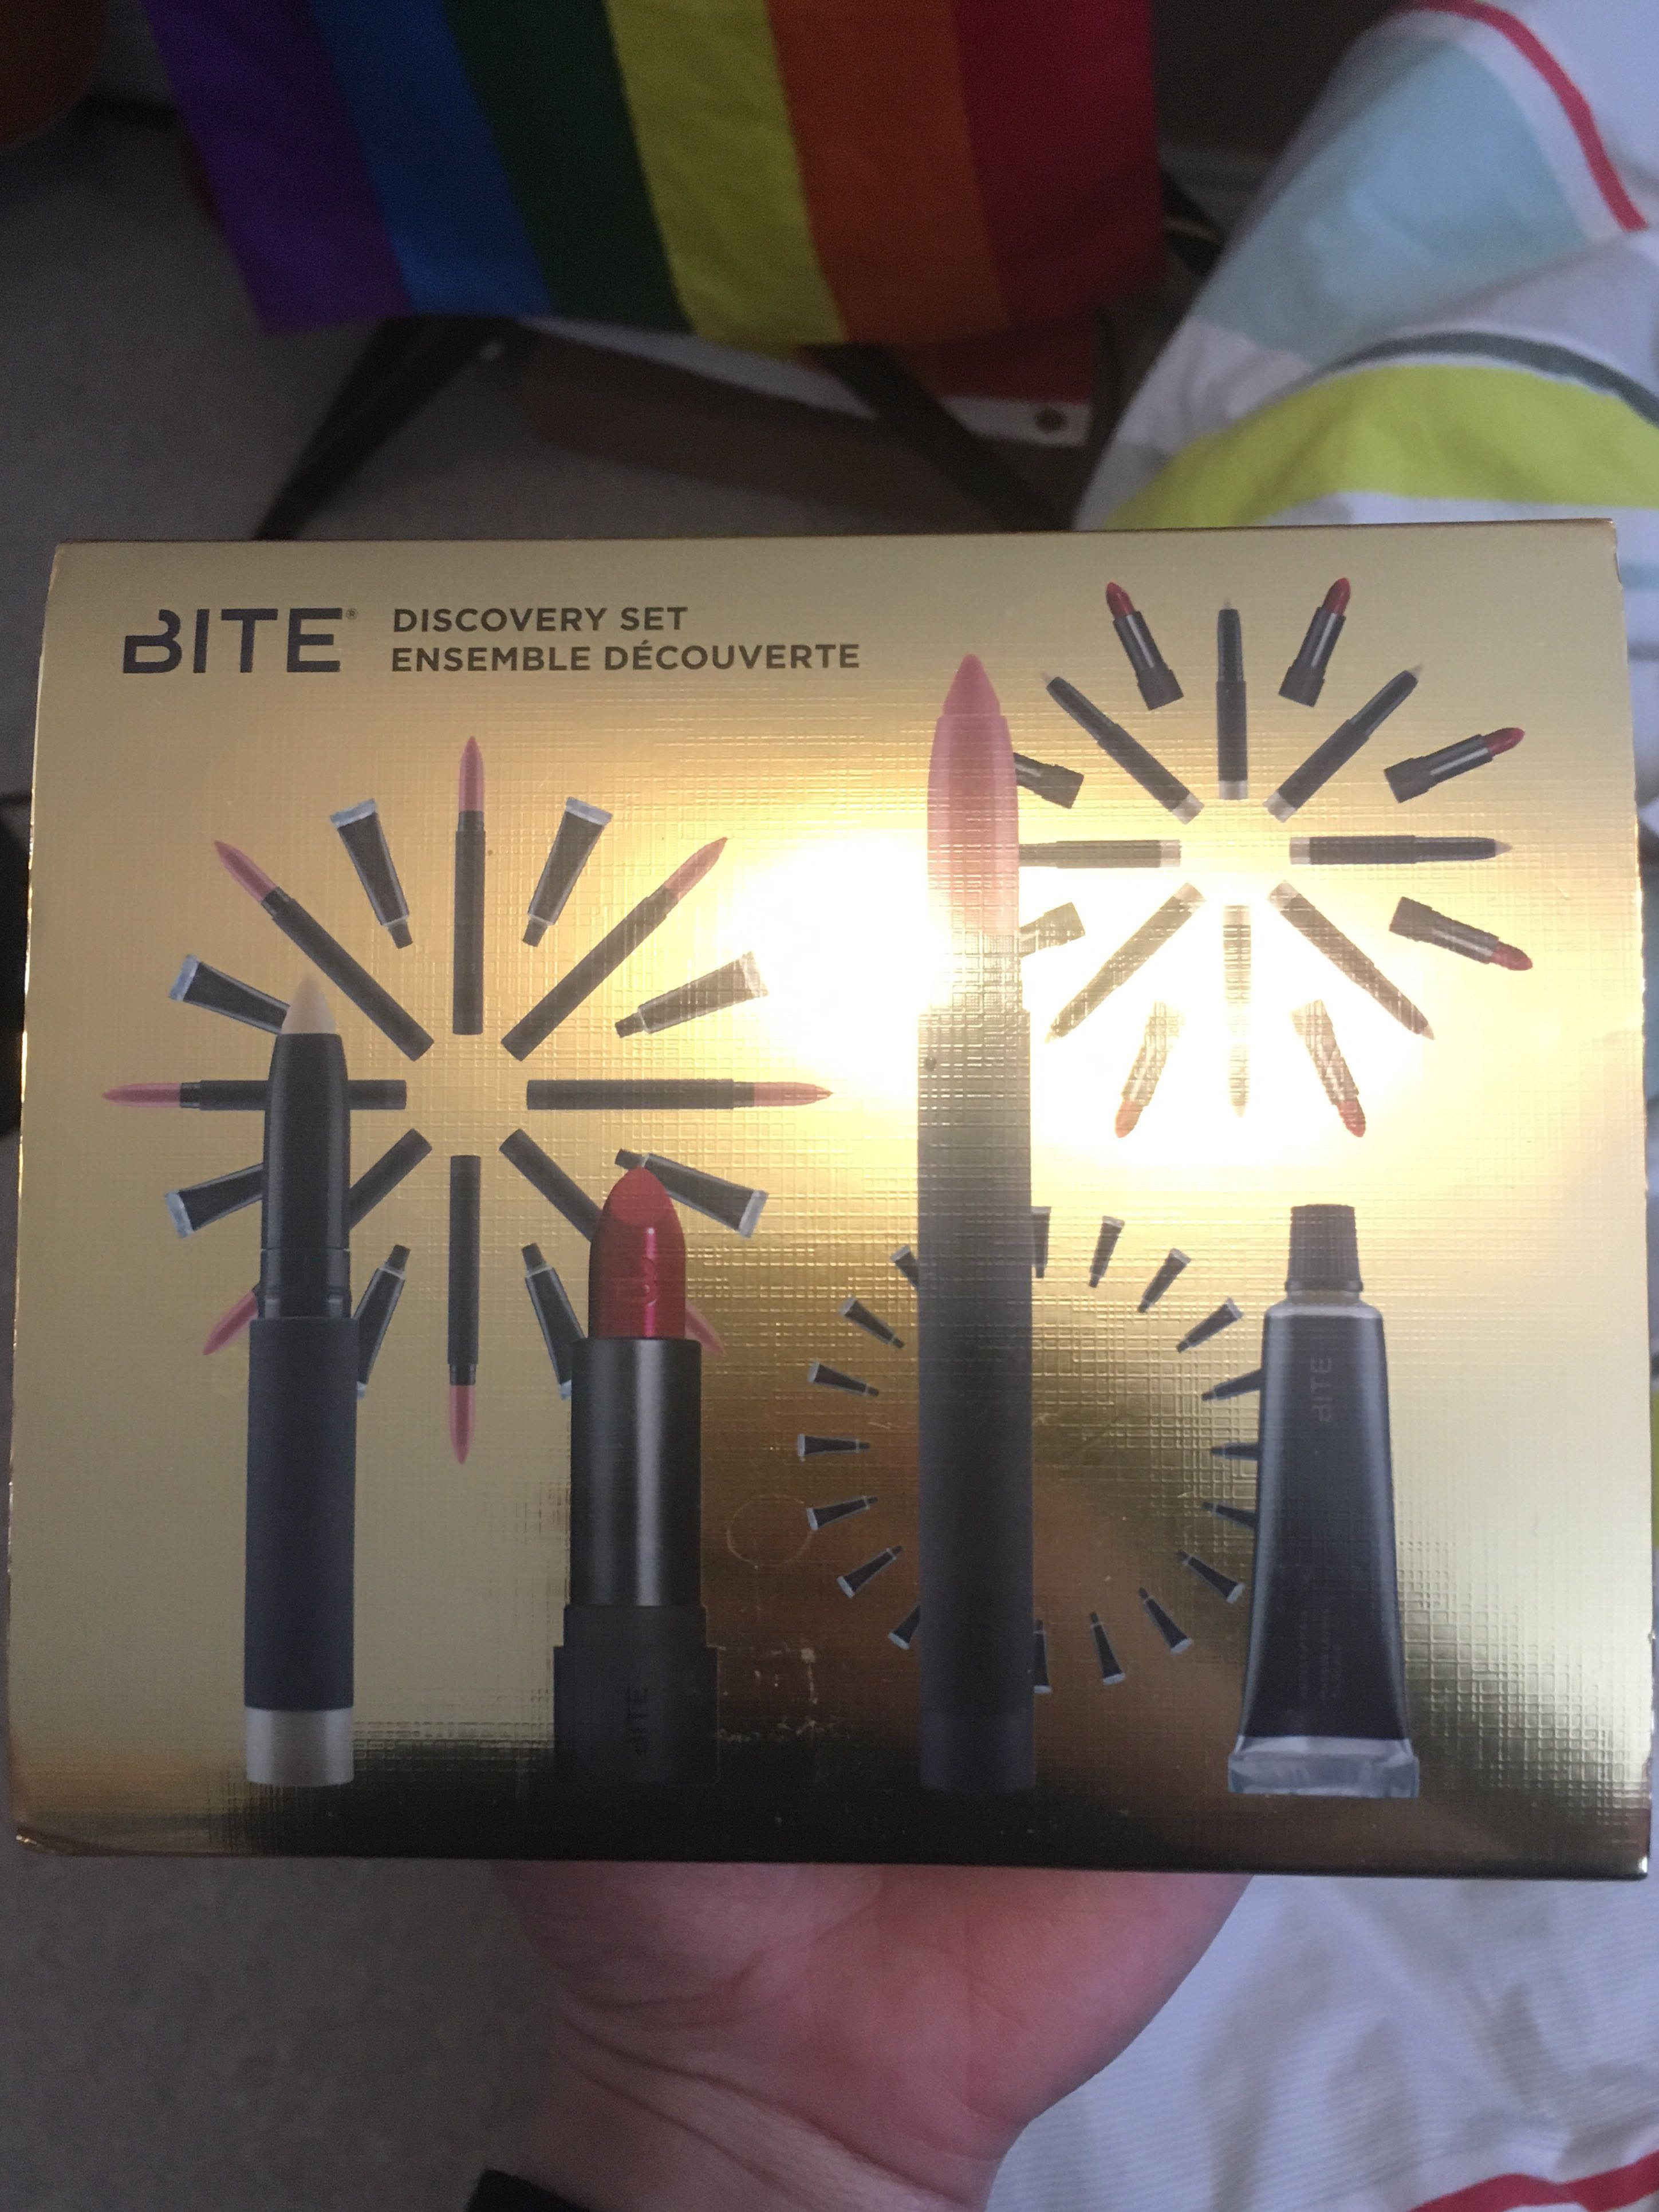 bite beauty discovery set